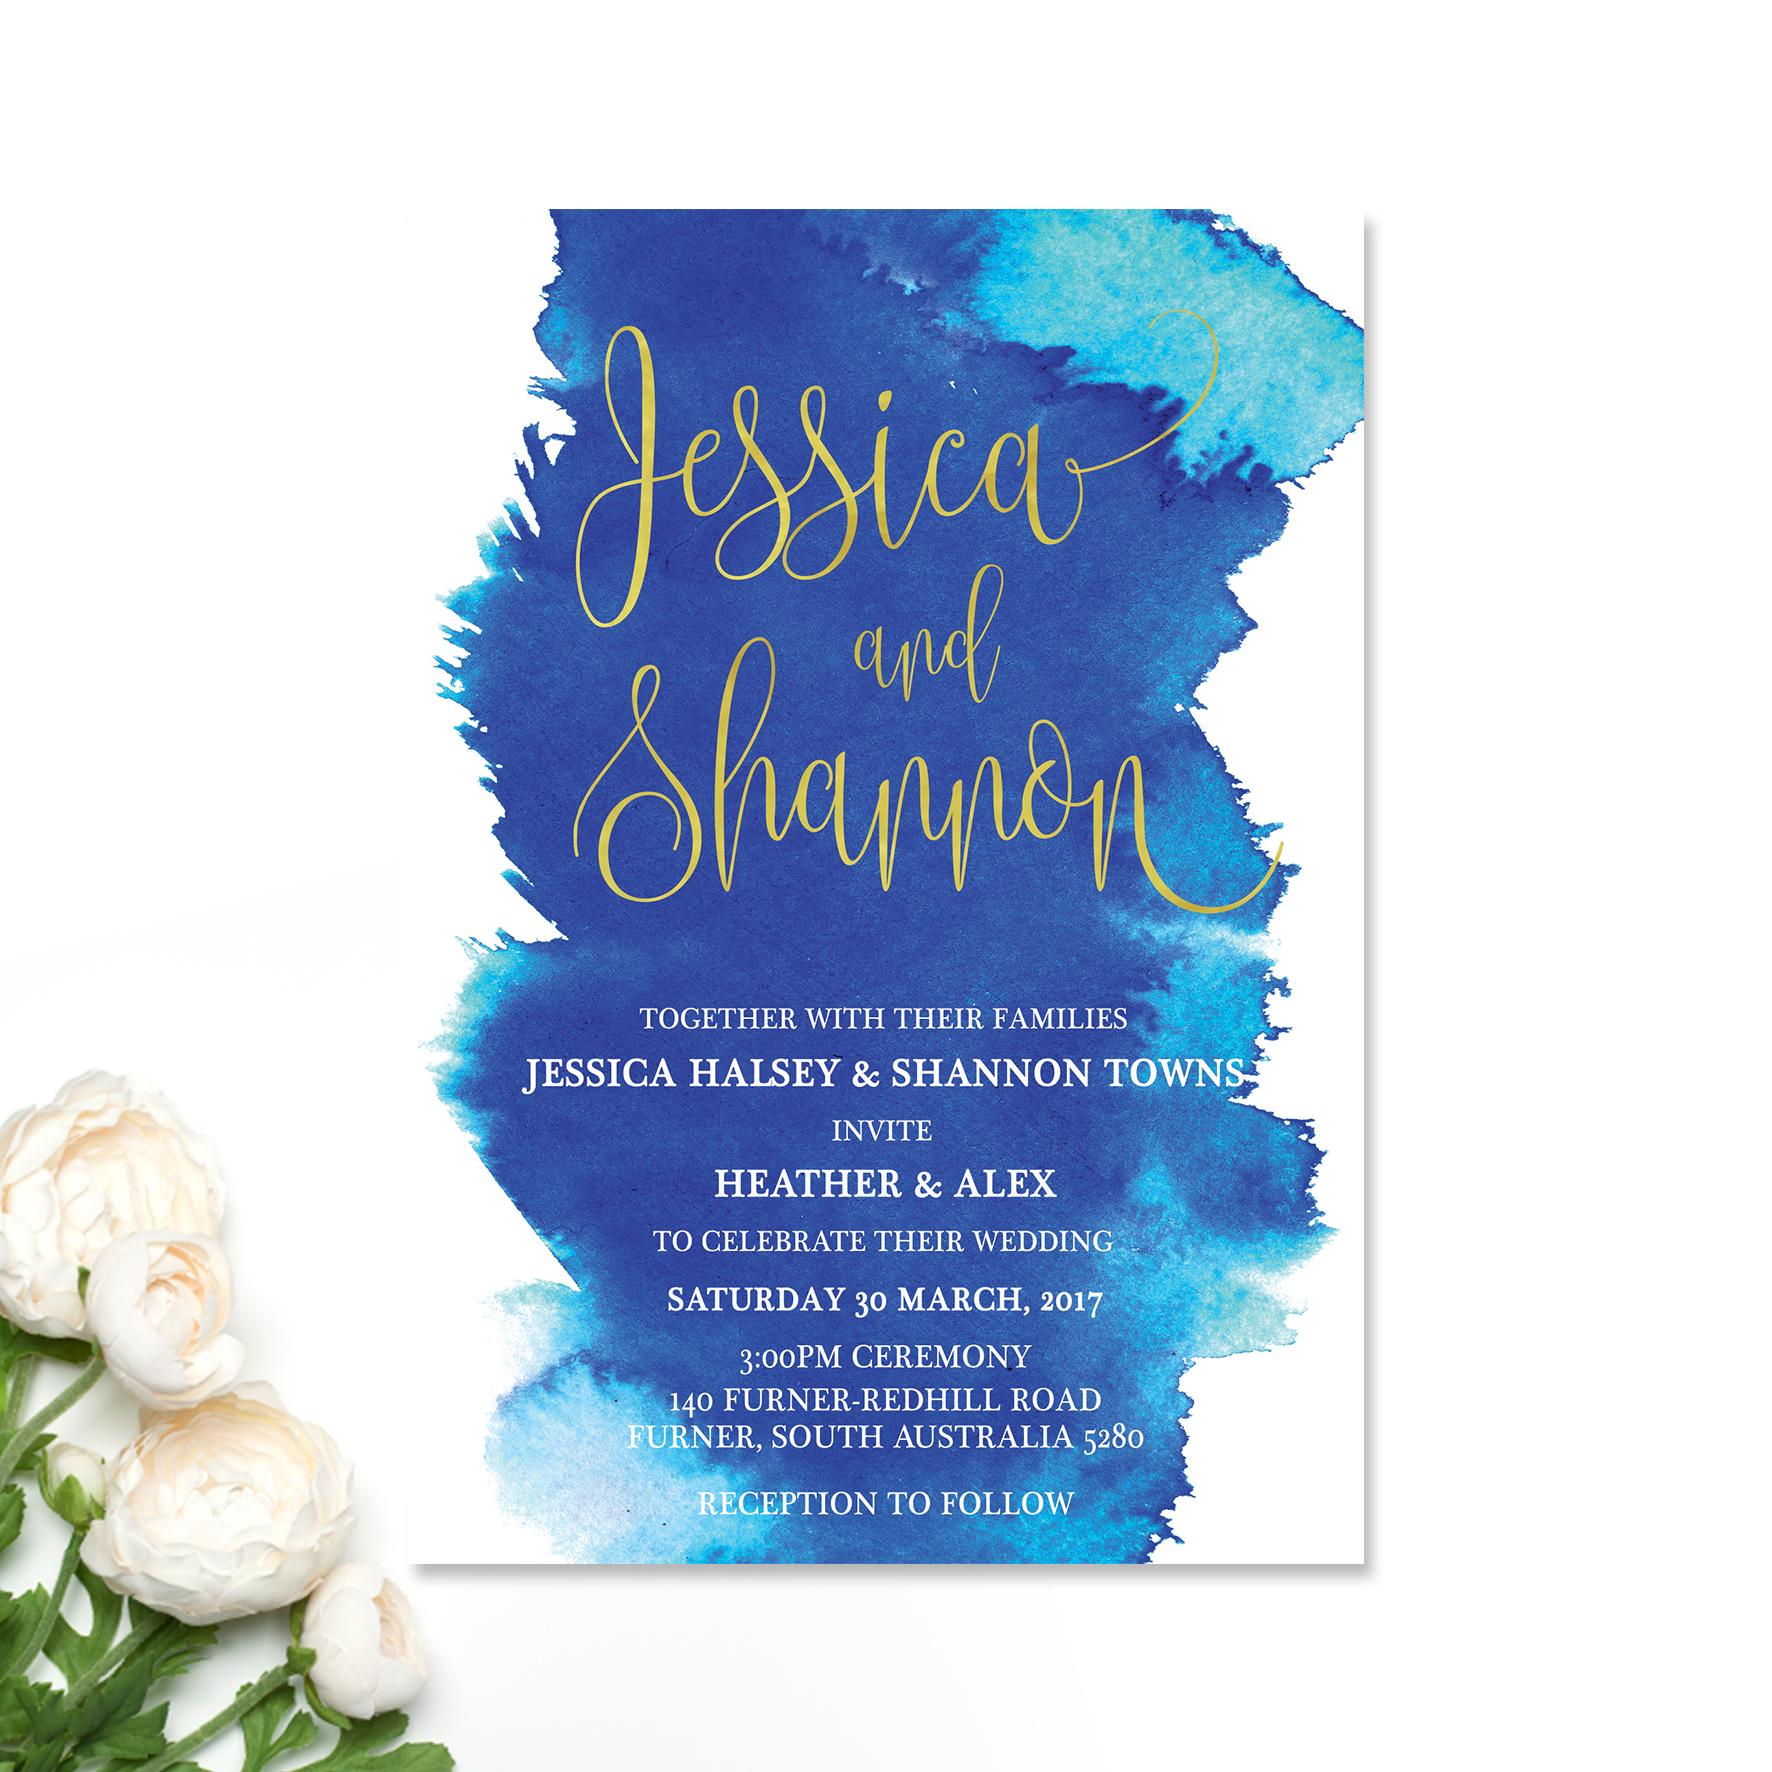 Jessica + Shannon Wedding Invitation